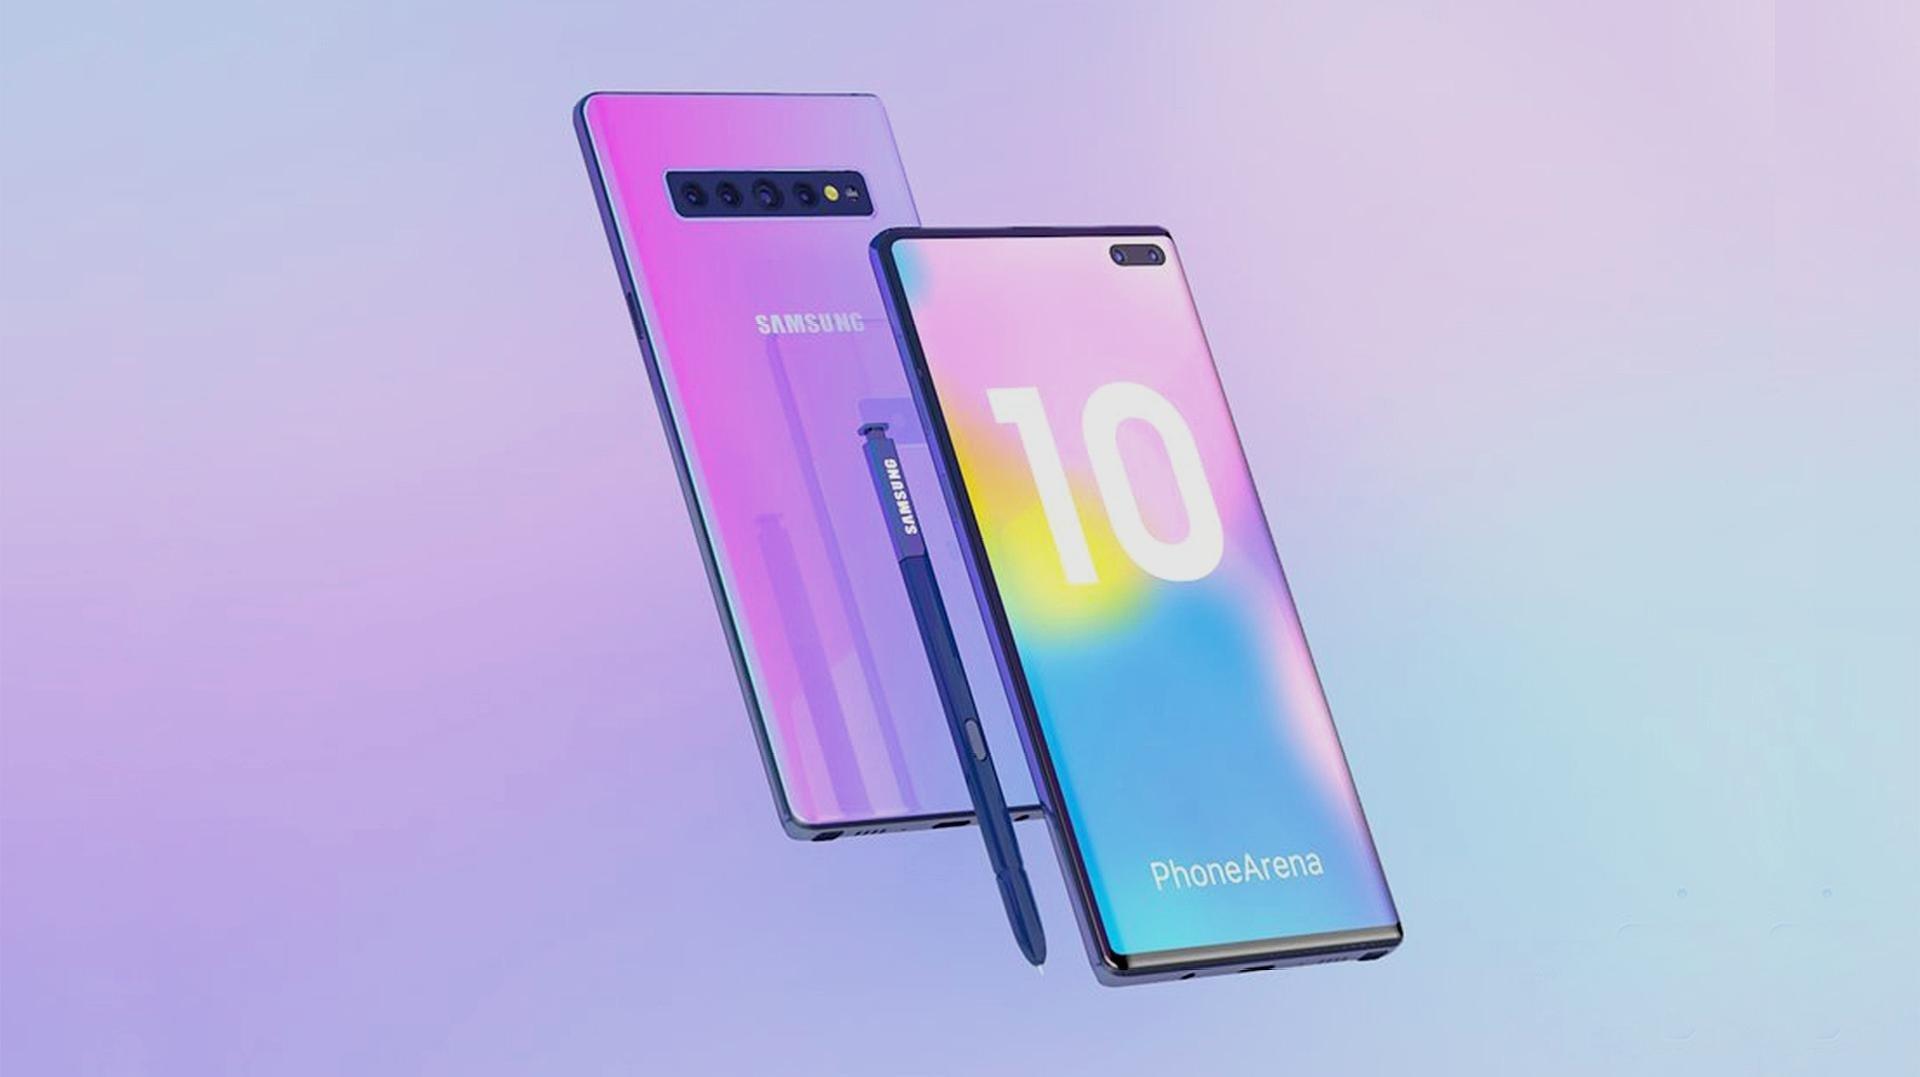 Teknoloji Haberleri (15 - 21 Eylül 2019) - Samsung Note 10 Reklamı